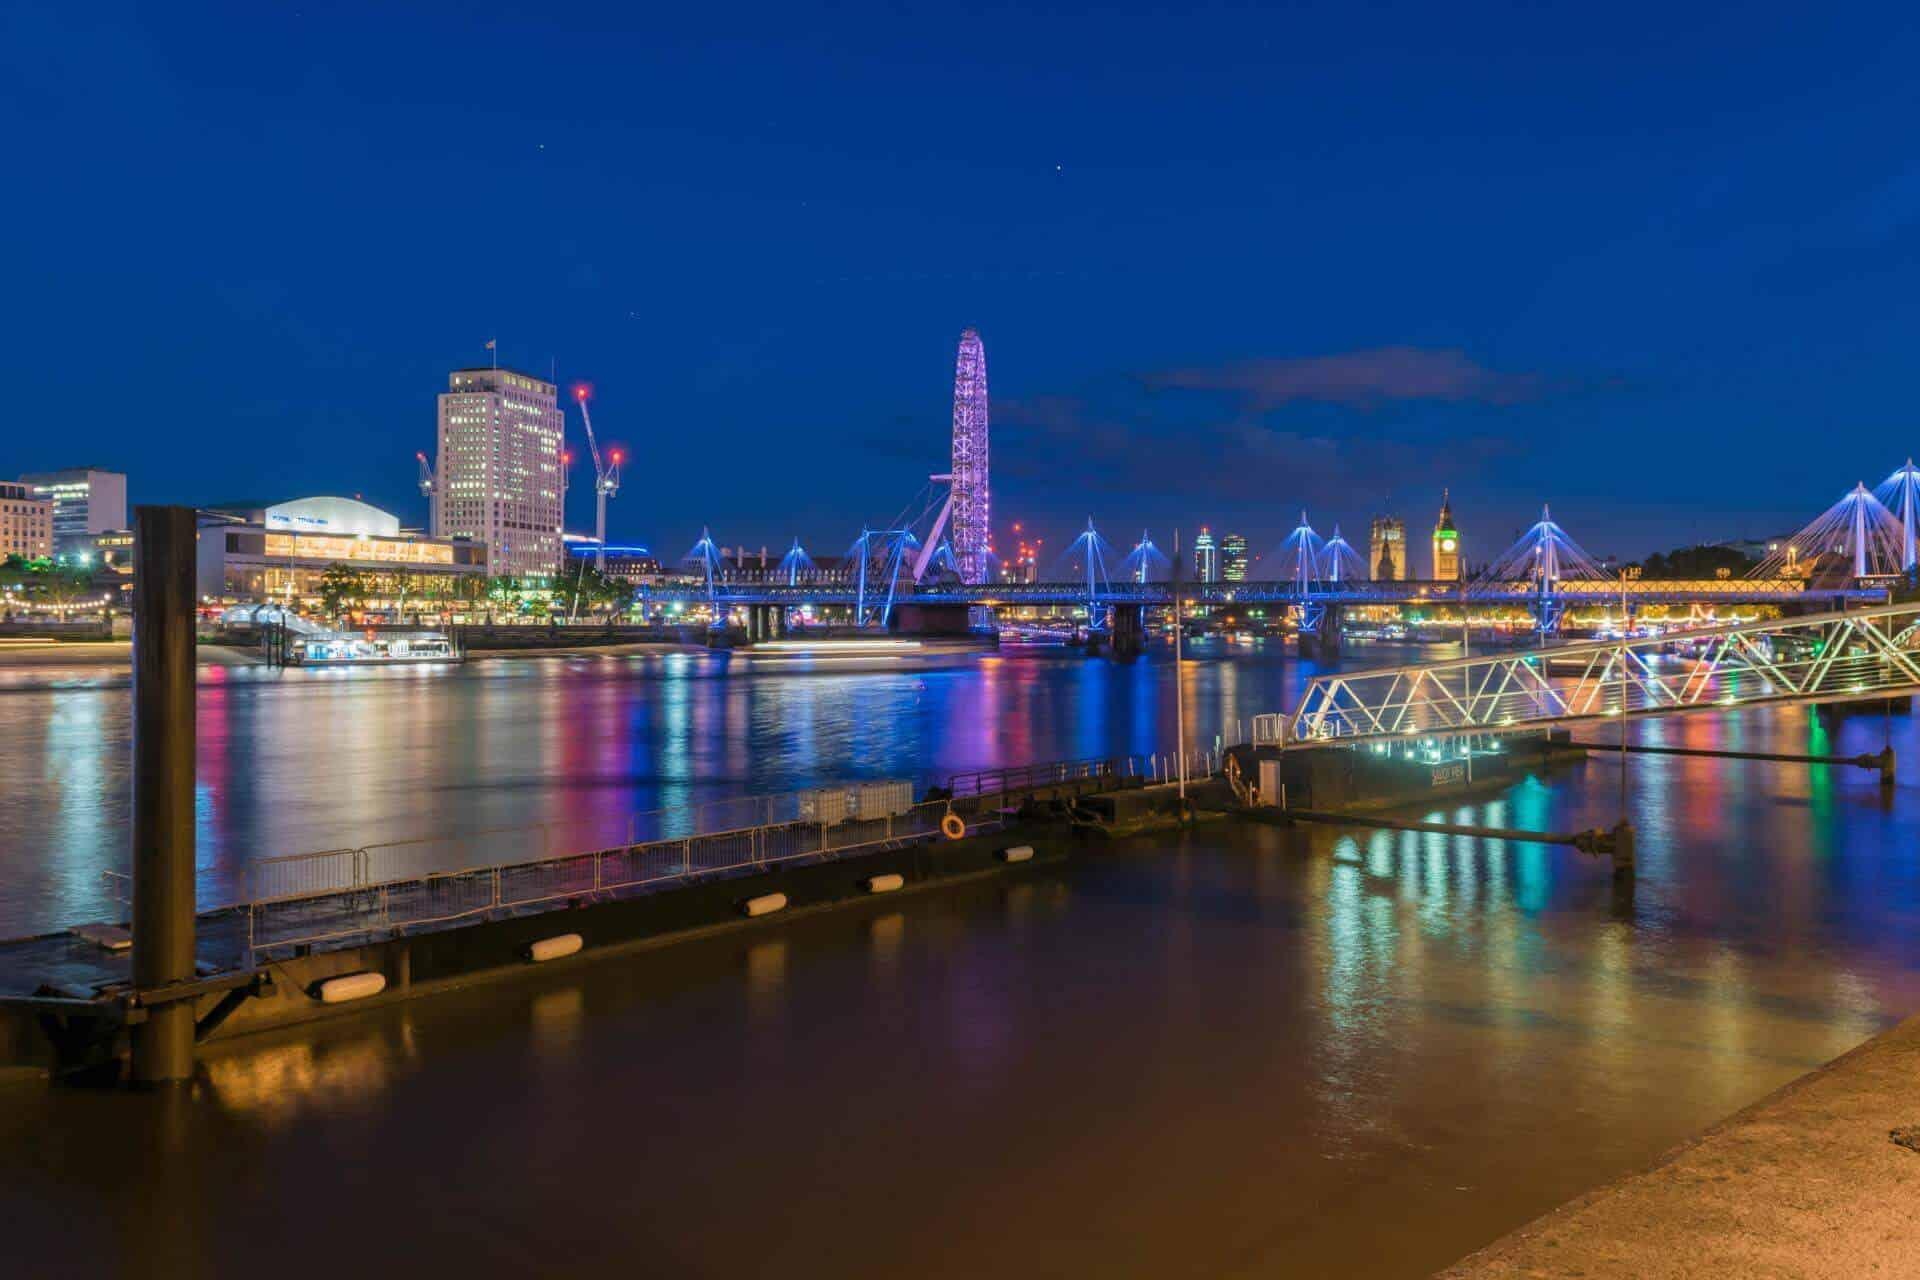 London Eye - Long exposure